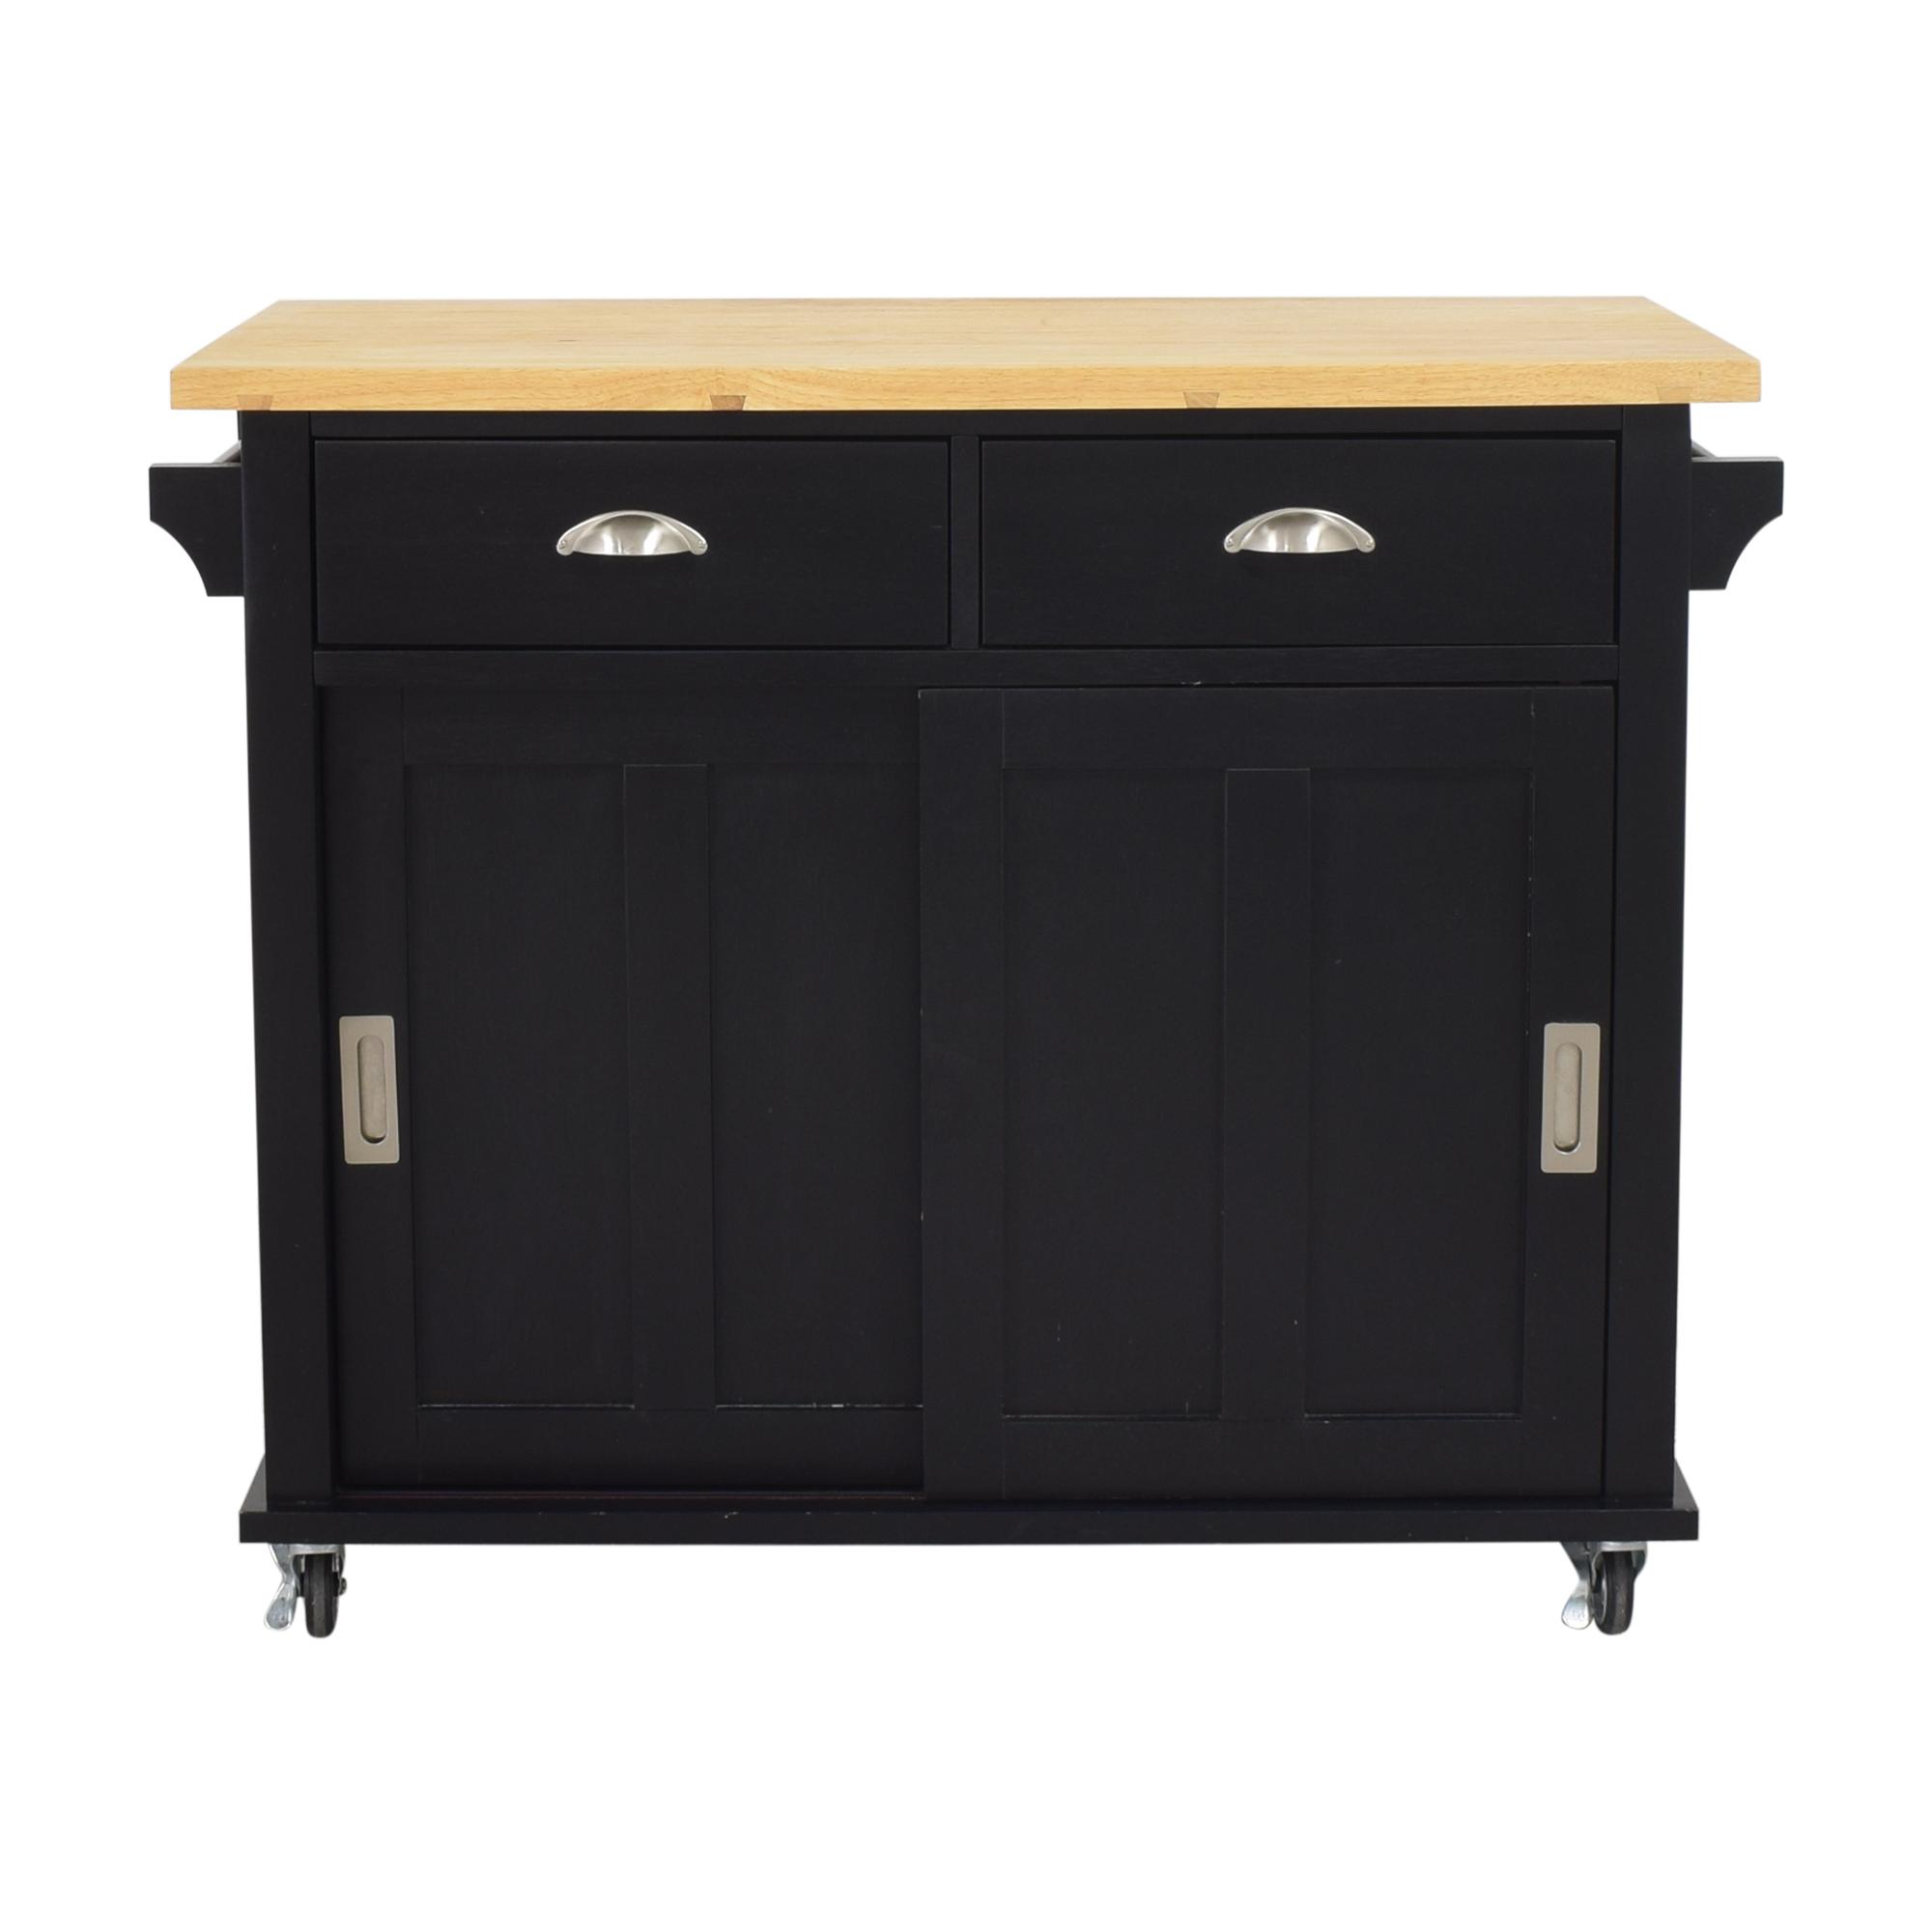 Crate & Barrel Belmont Kitchen Island Cart / Tables